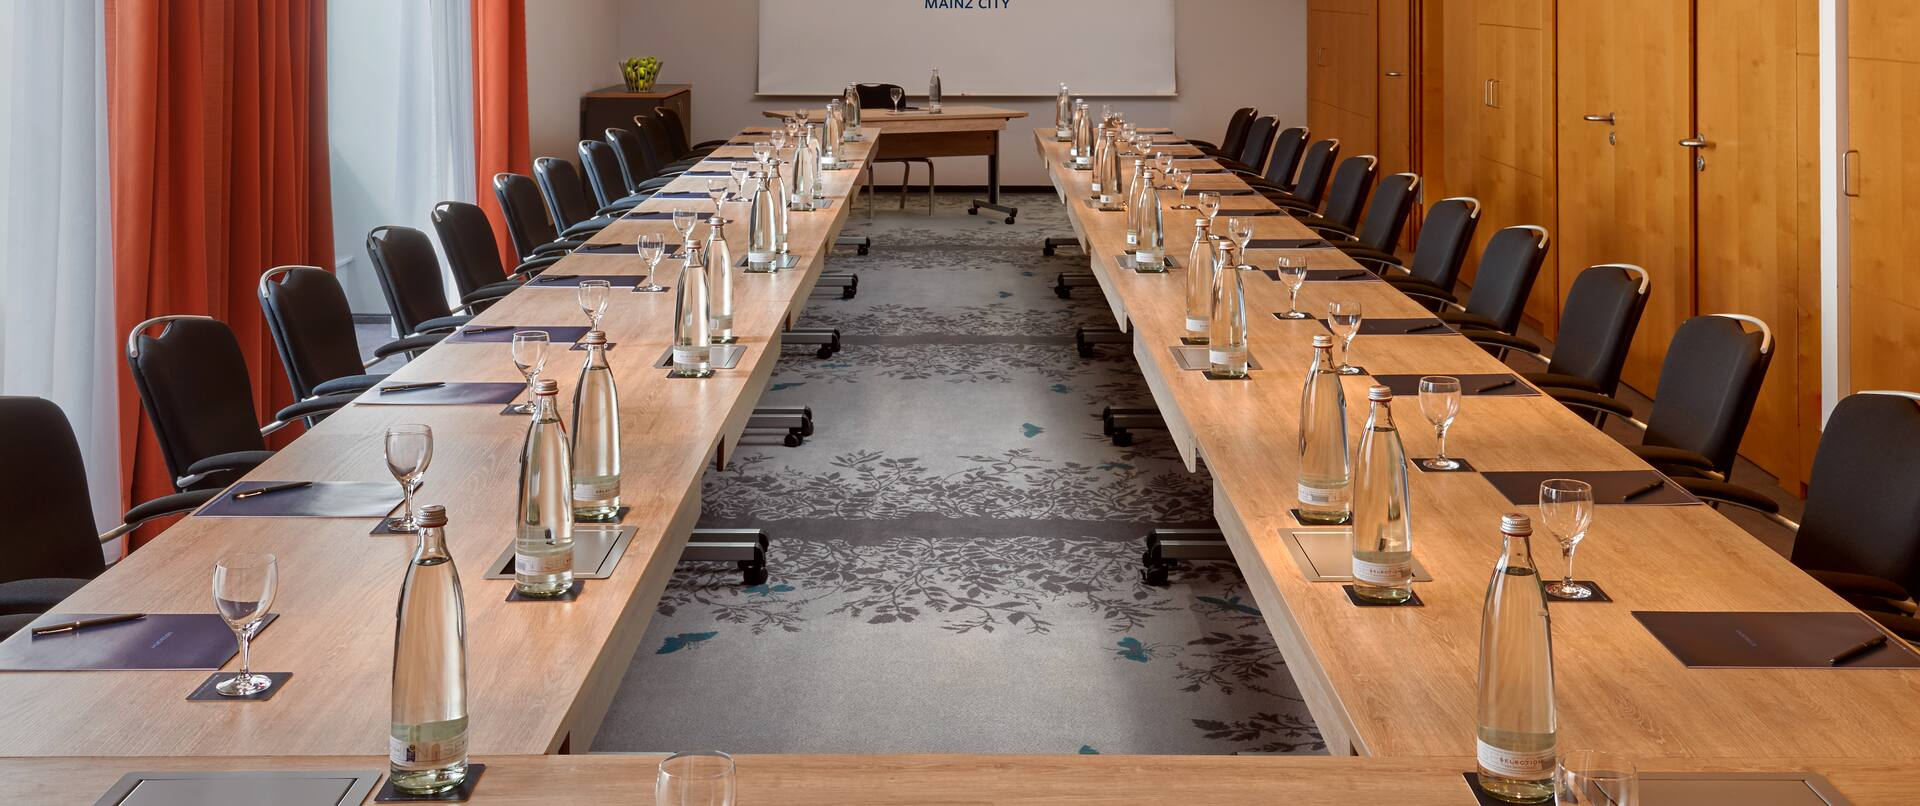 Long U-Shaped Meeting Table